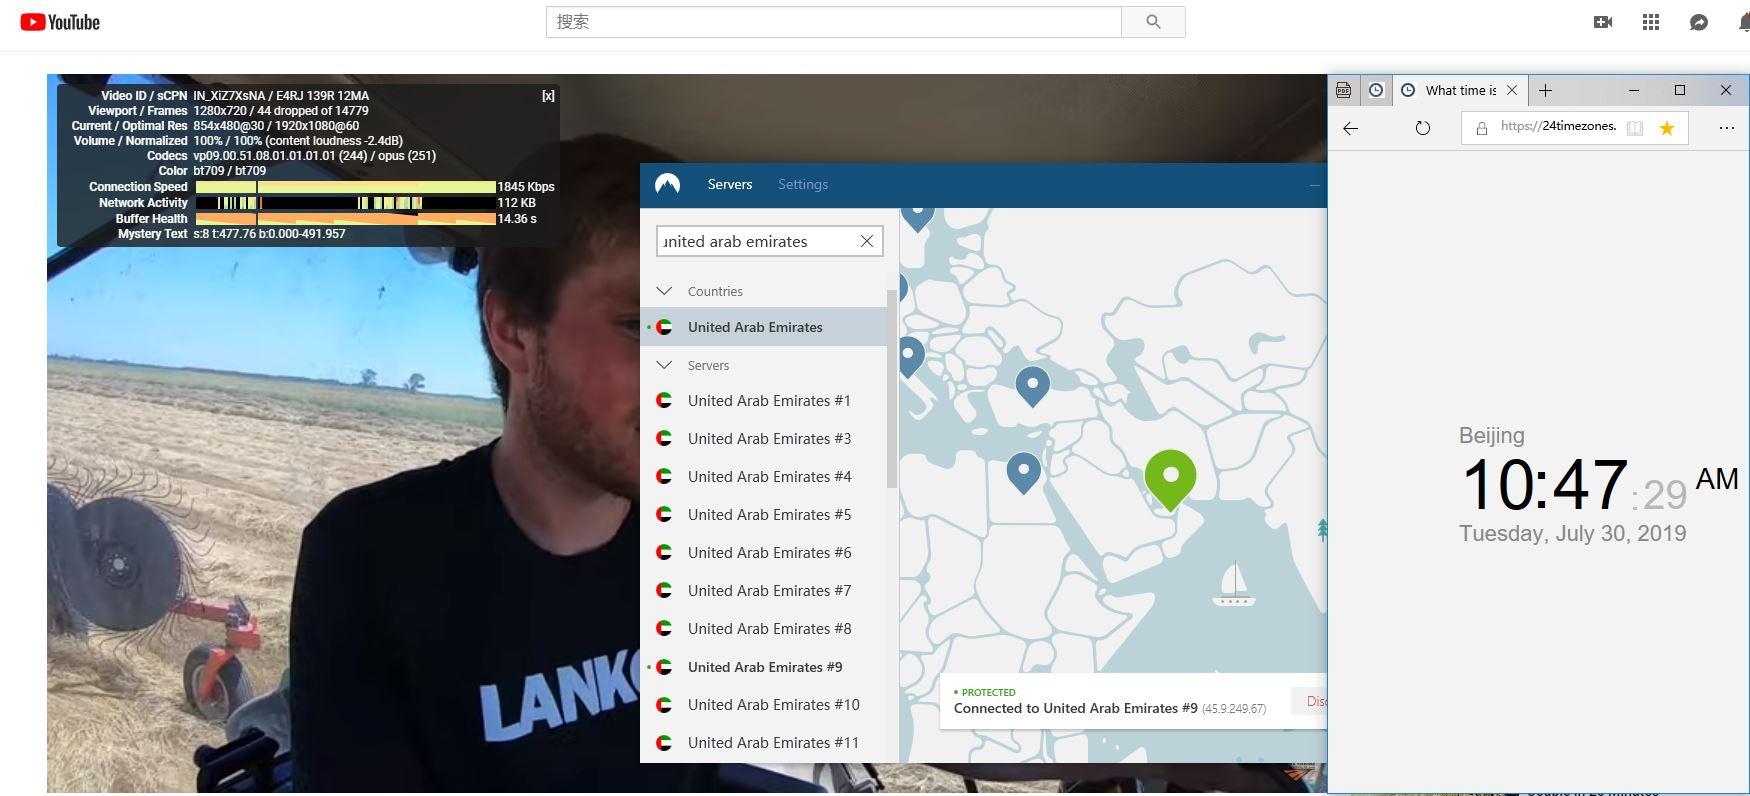 windows-nordvpn-udp协议-中国翻墙-科学上网-阿联酋9服务器-YouTube-20190730